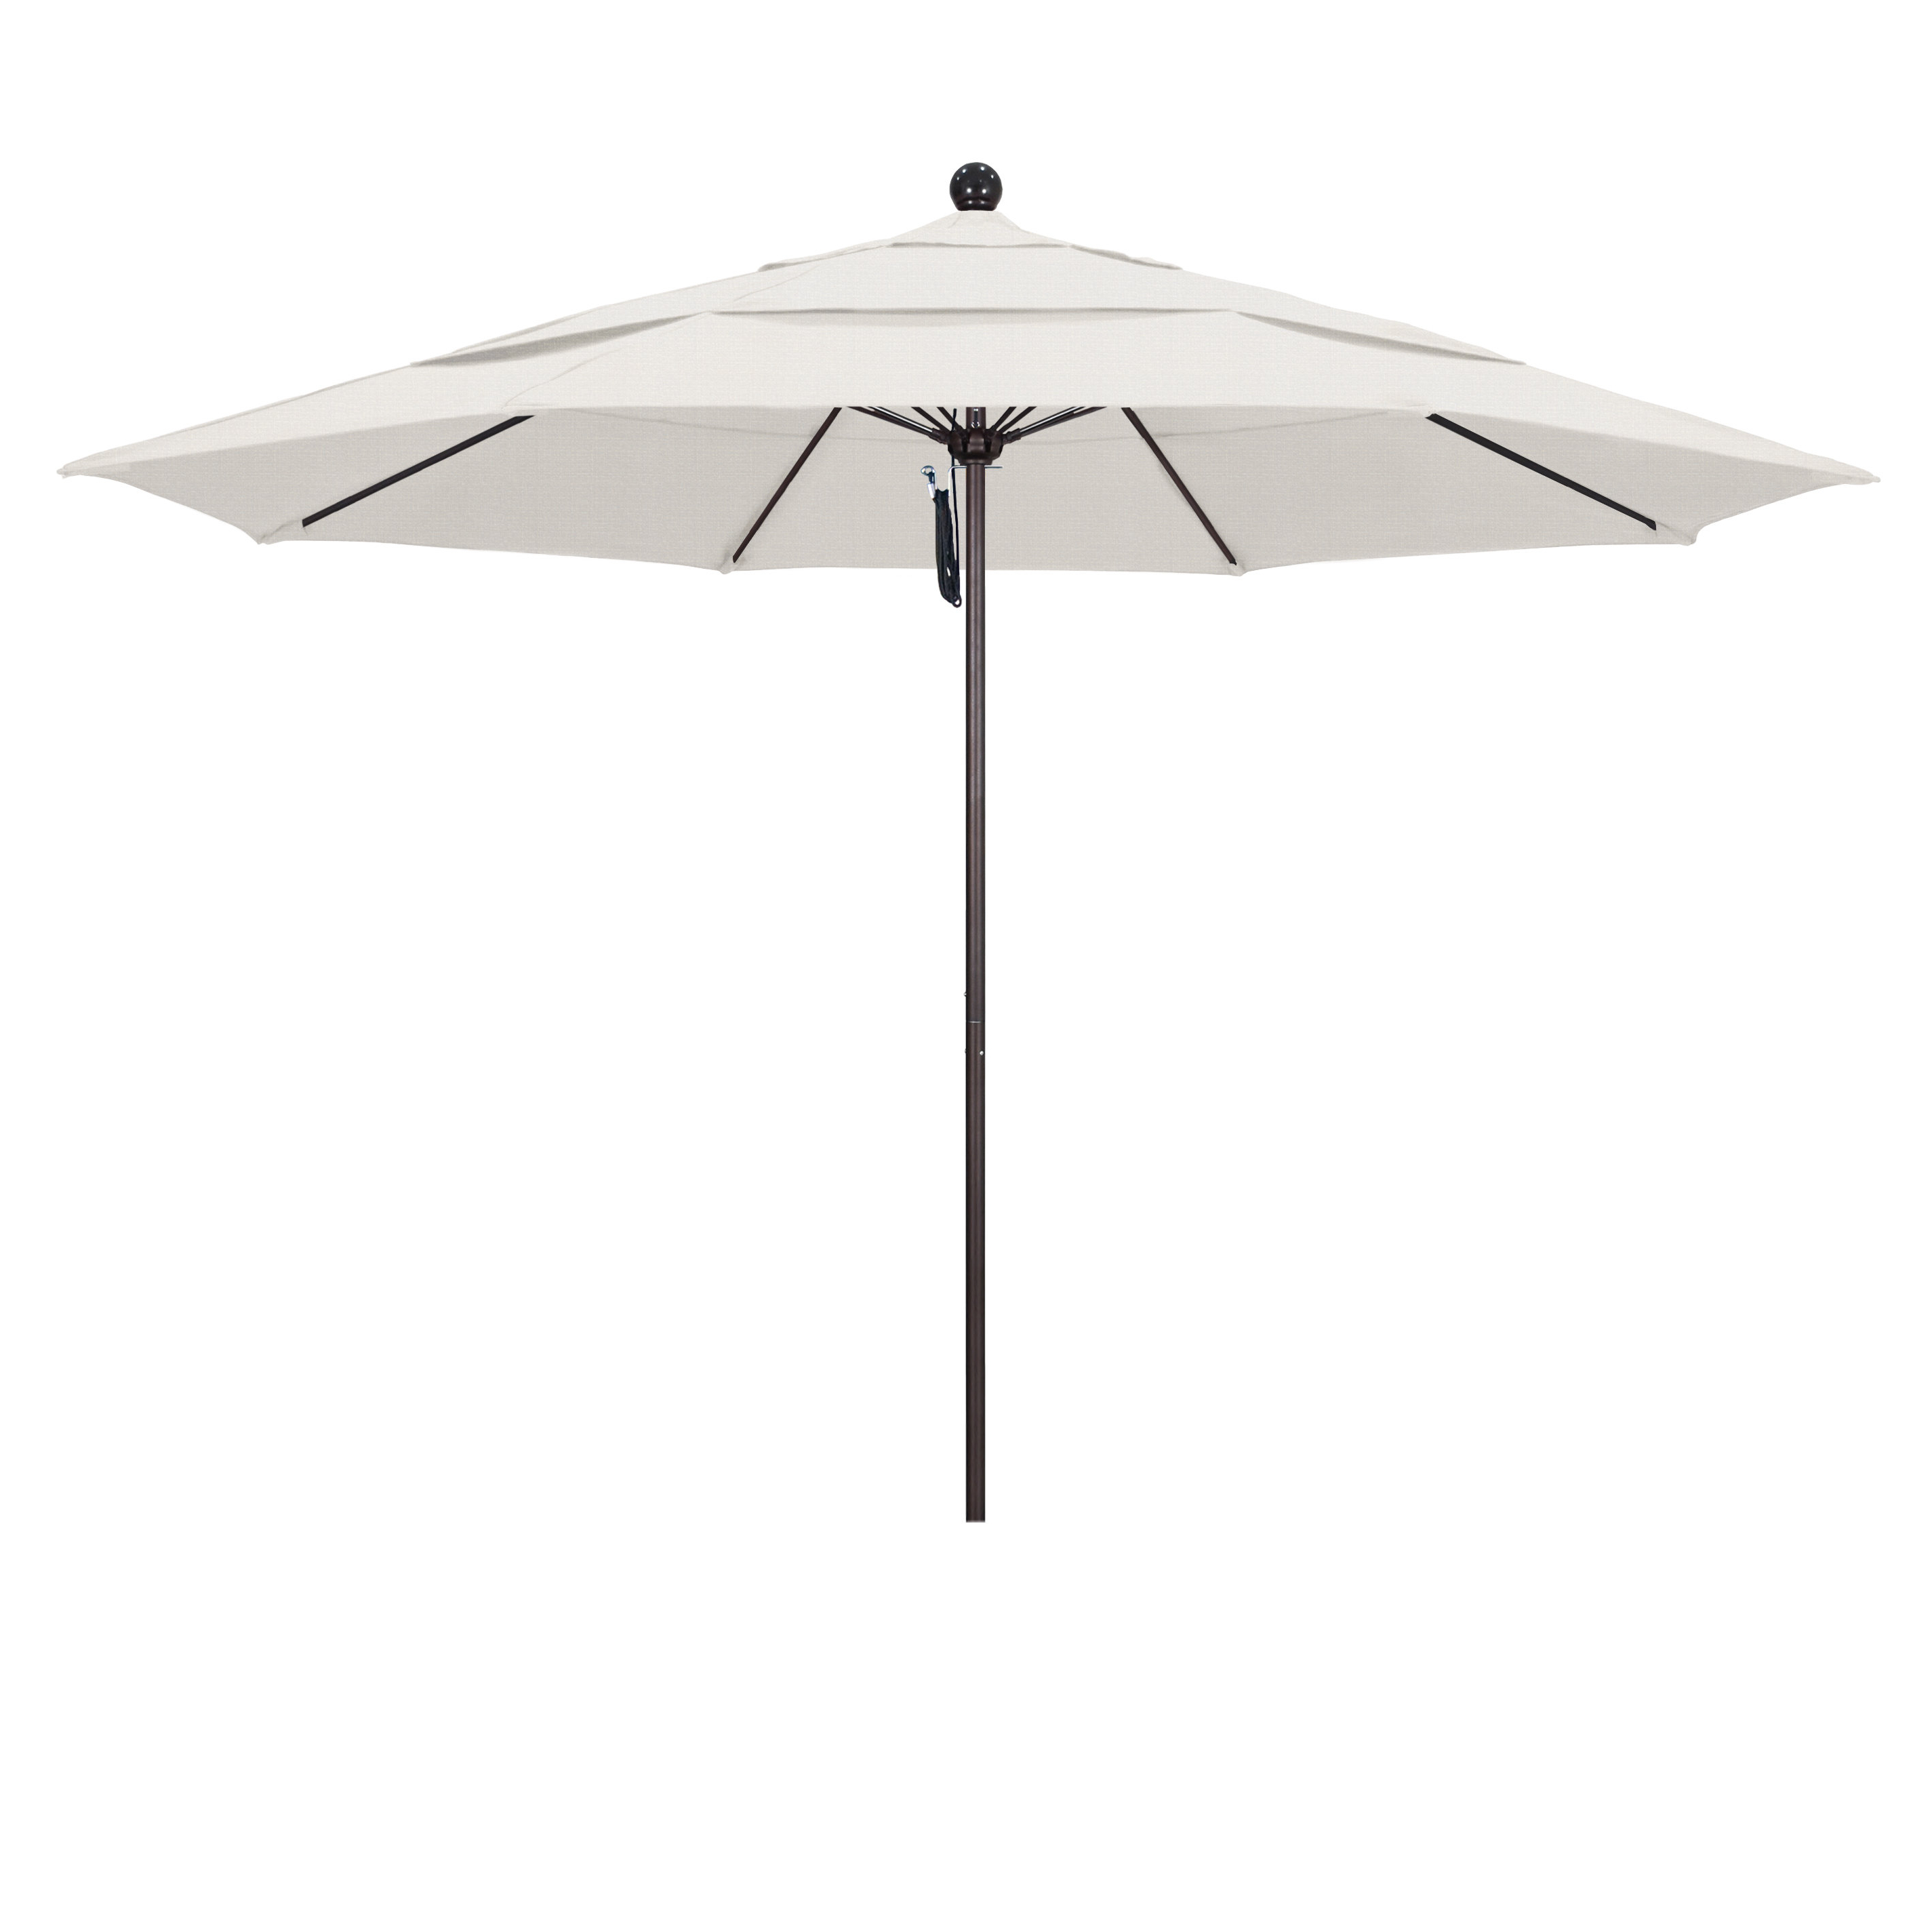 Recent Launceston Rectangular Market Umbrellas With Regard To Davenport 11' Market Umbrella (View 15 of 20)